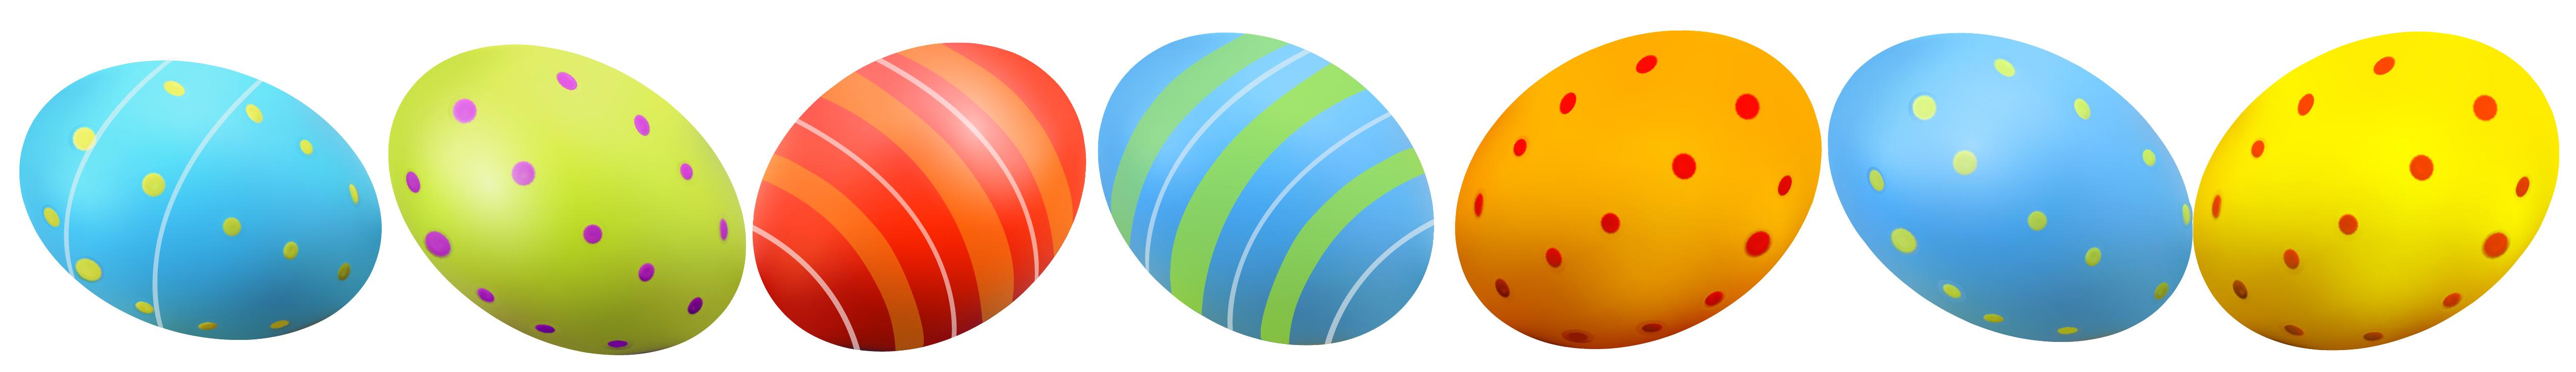 easter-egg-border-clipart-15 | Armenian Missionary Association of America